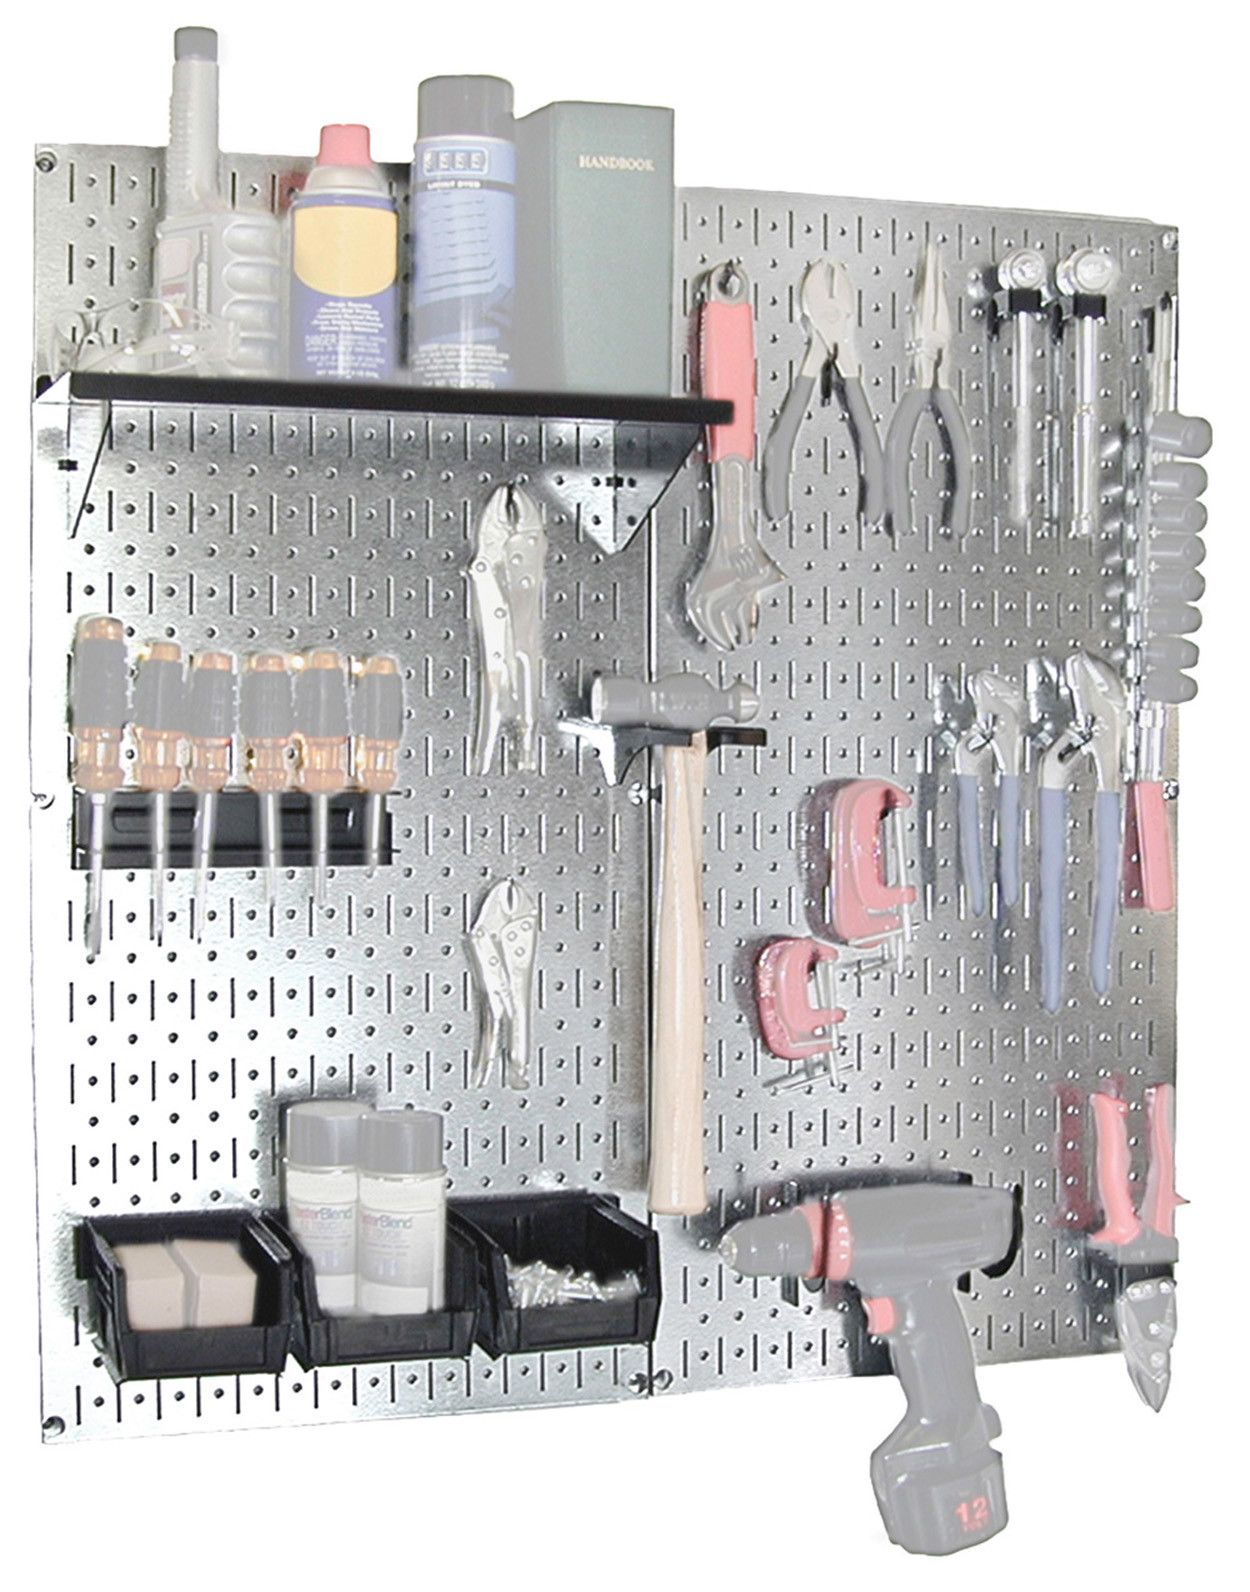 Wall Control Utility Tool Storage And Garage Pegboard Organizer Kit Reviews Wayfair Supply Pegboard Organization Steel Pegboard Storage Kits